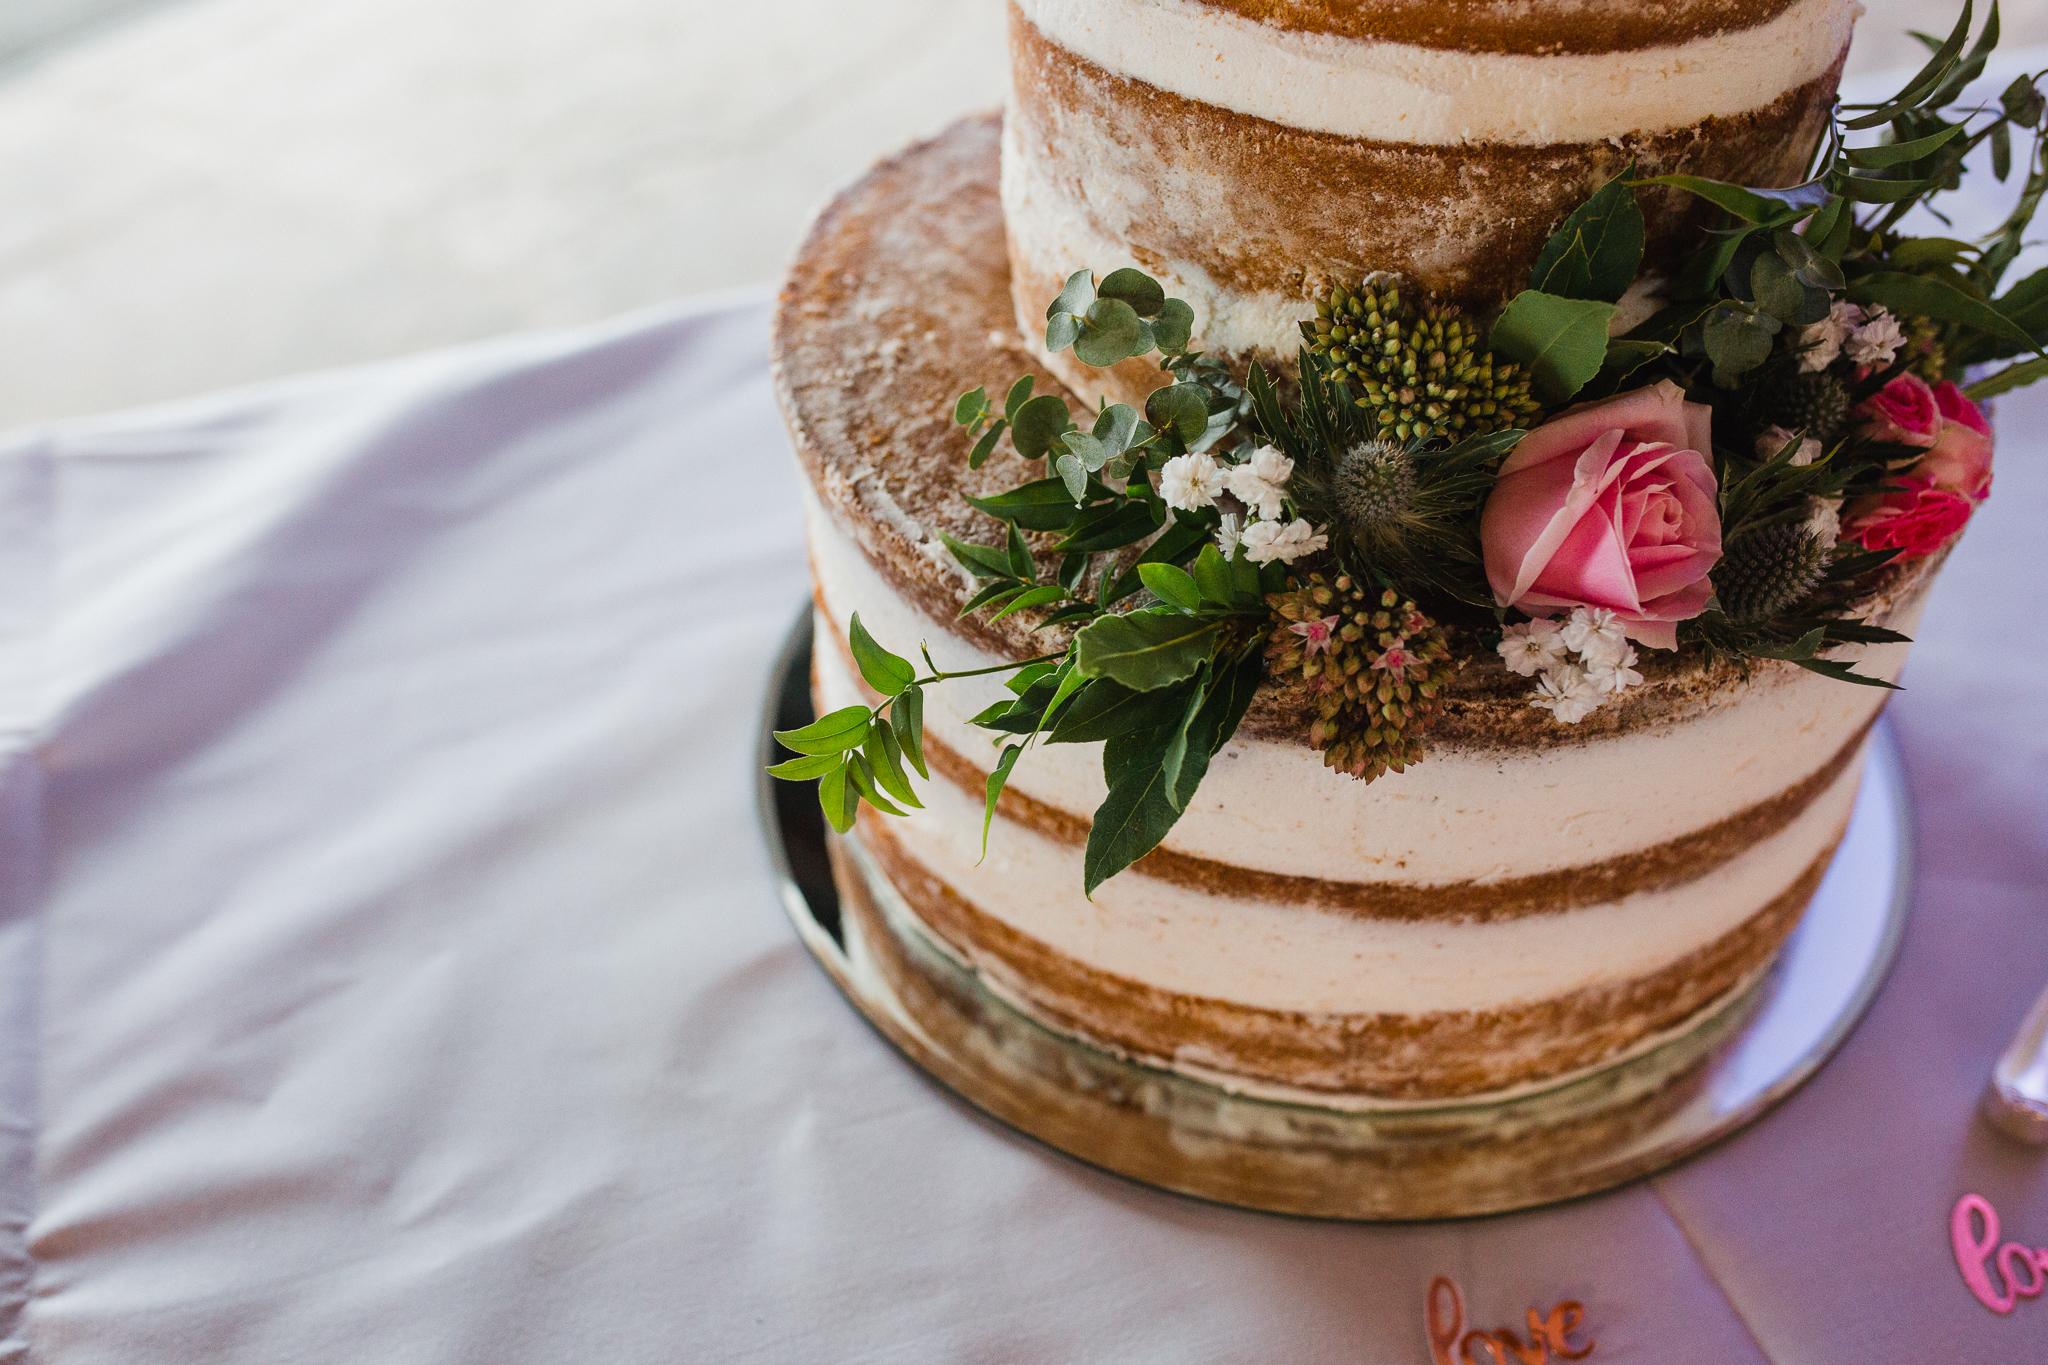 Jess and Ben - Liverpool wedding - wedding cake details